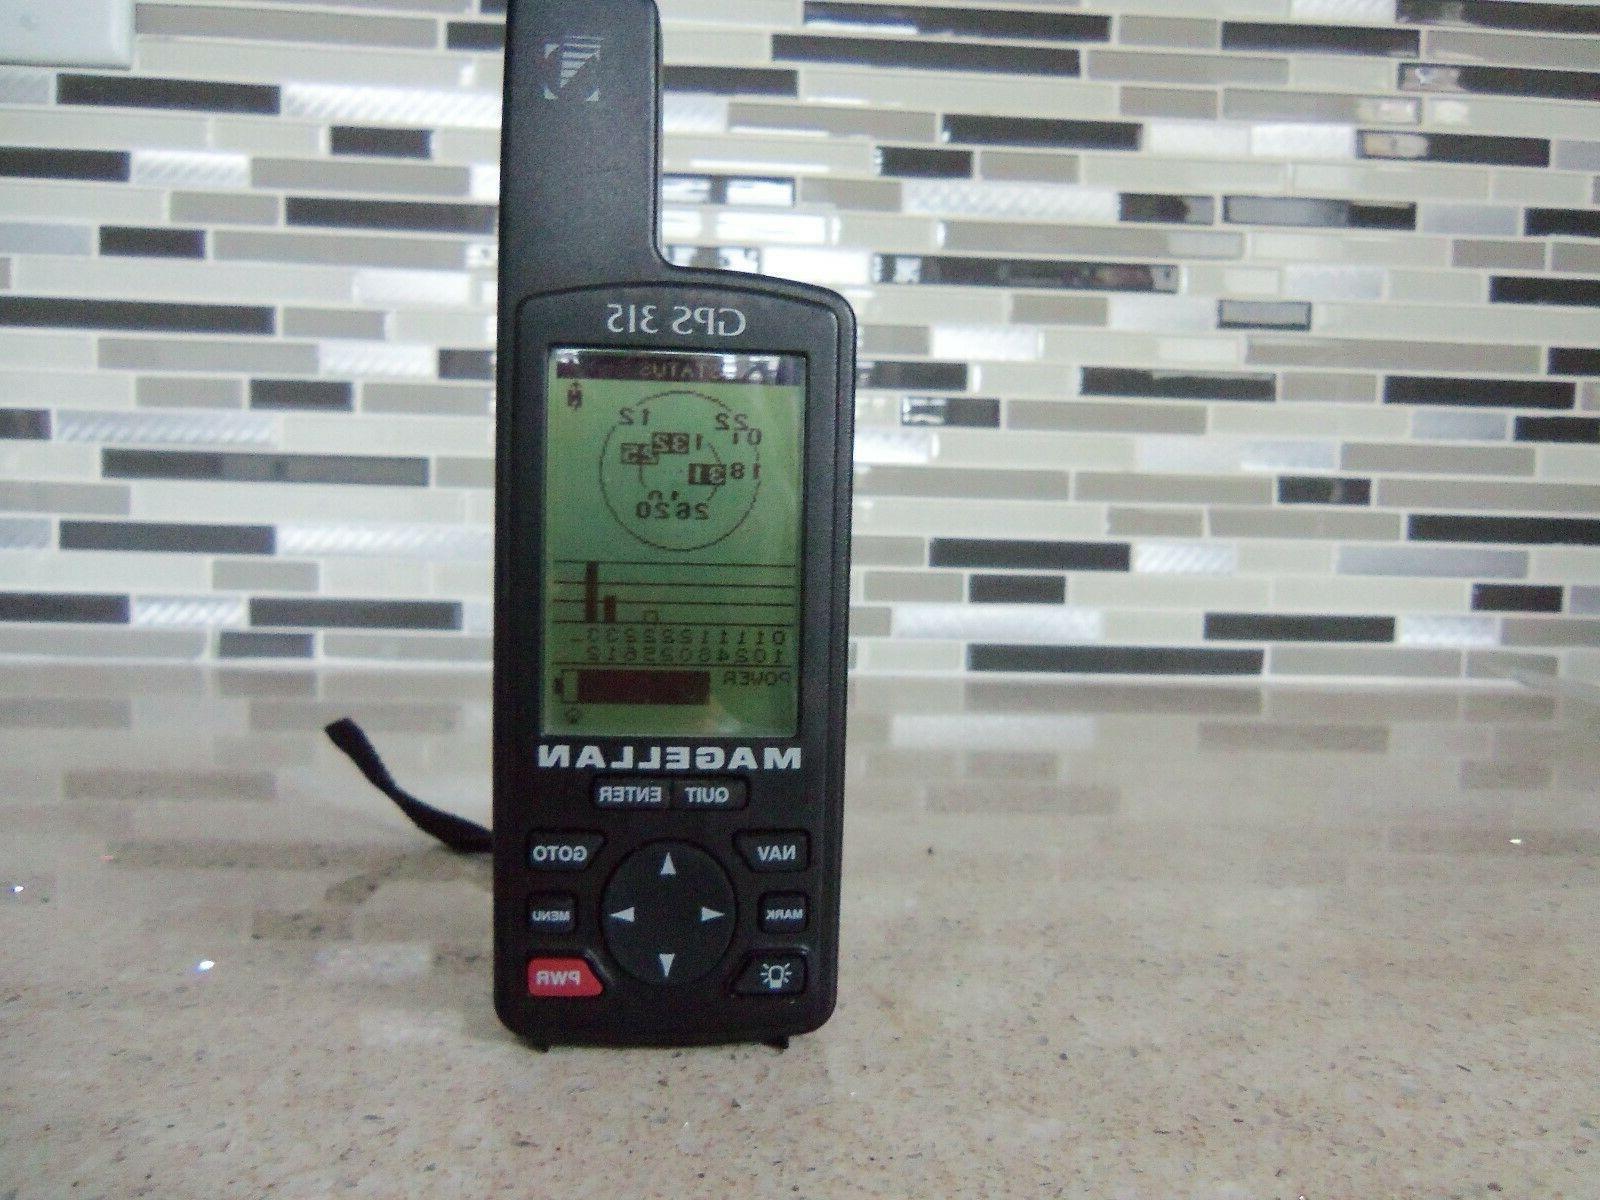 gps 315 handheld receiver marine outdoor hiking